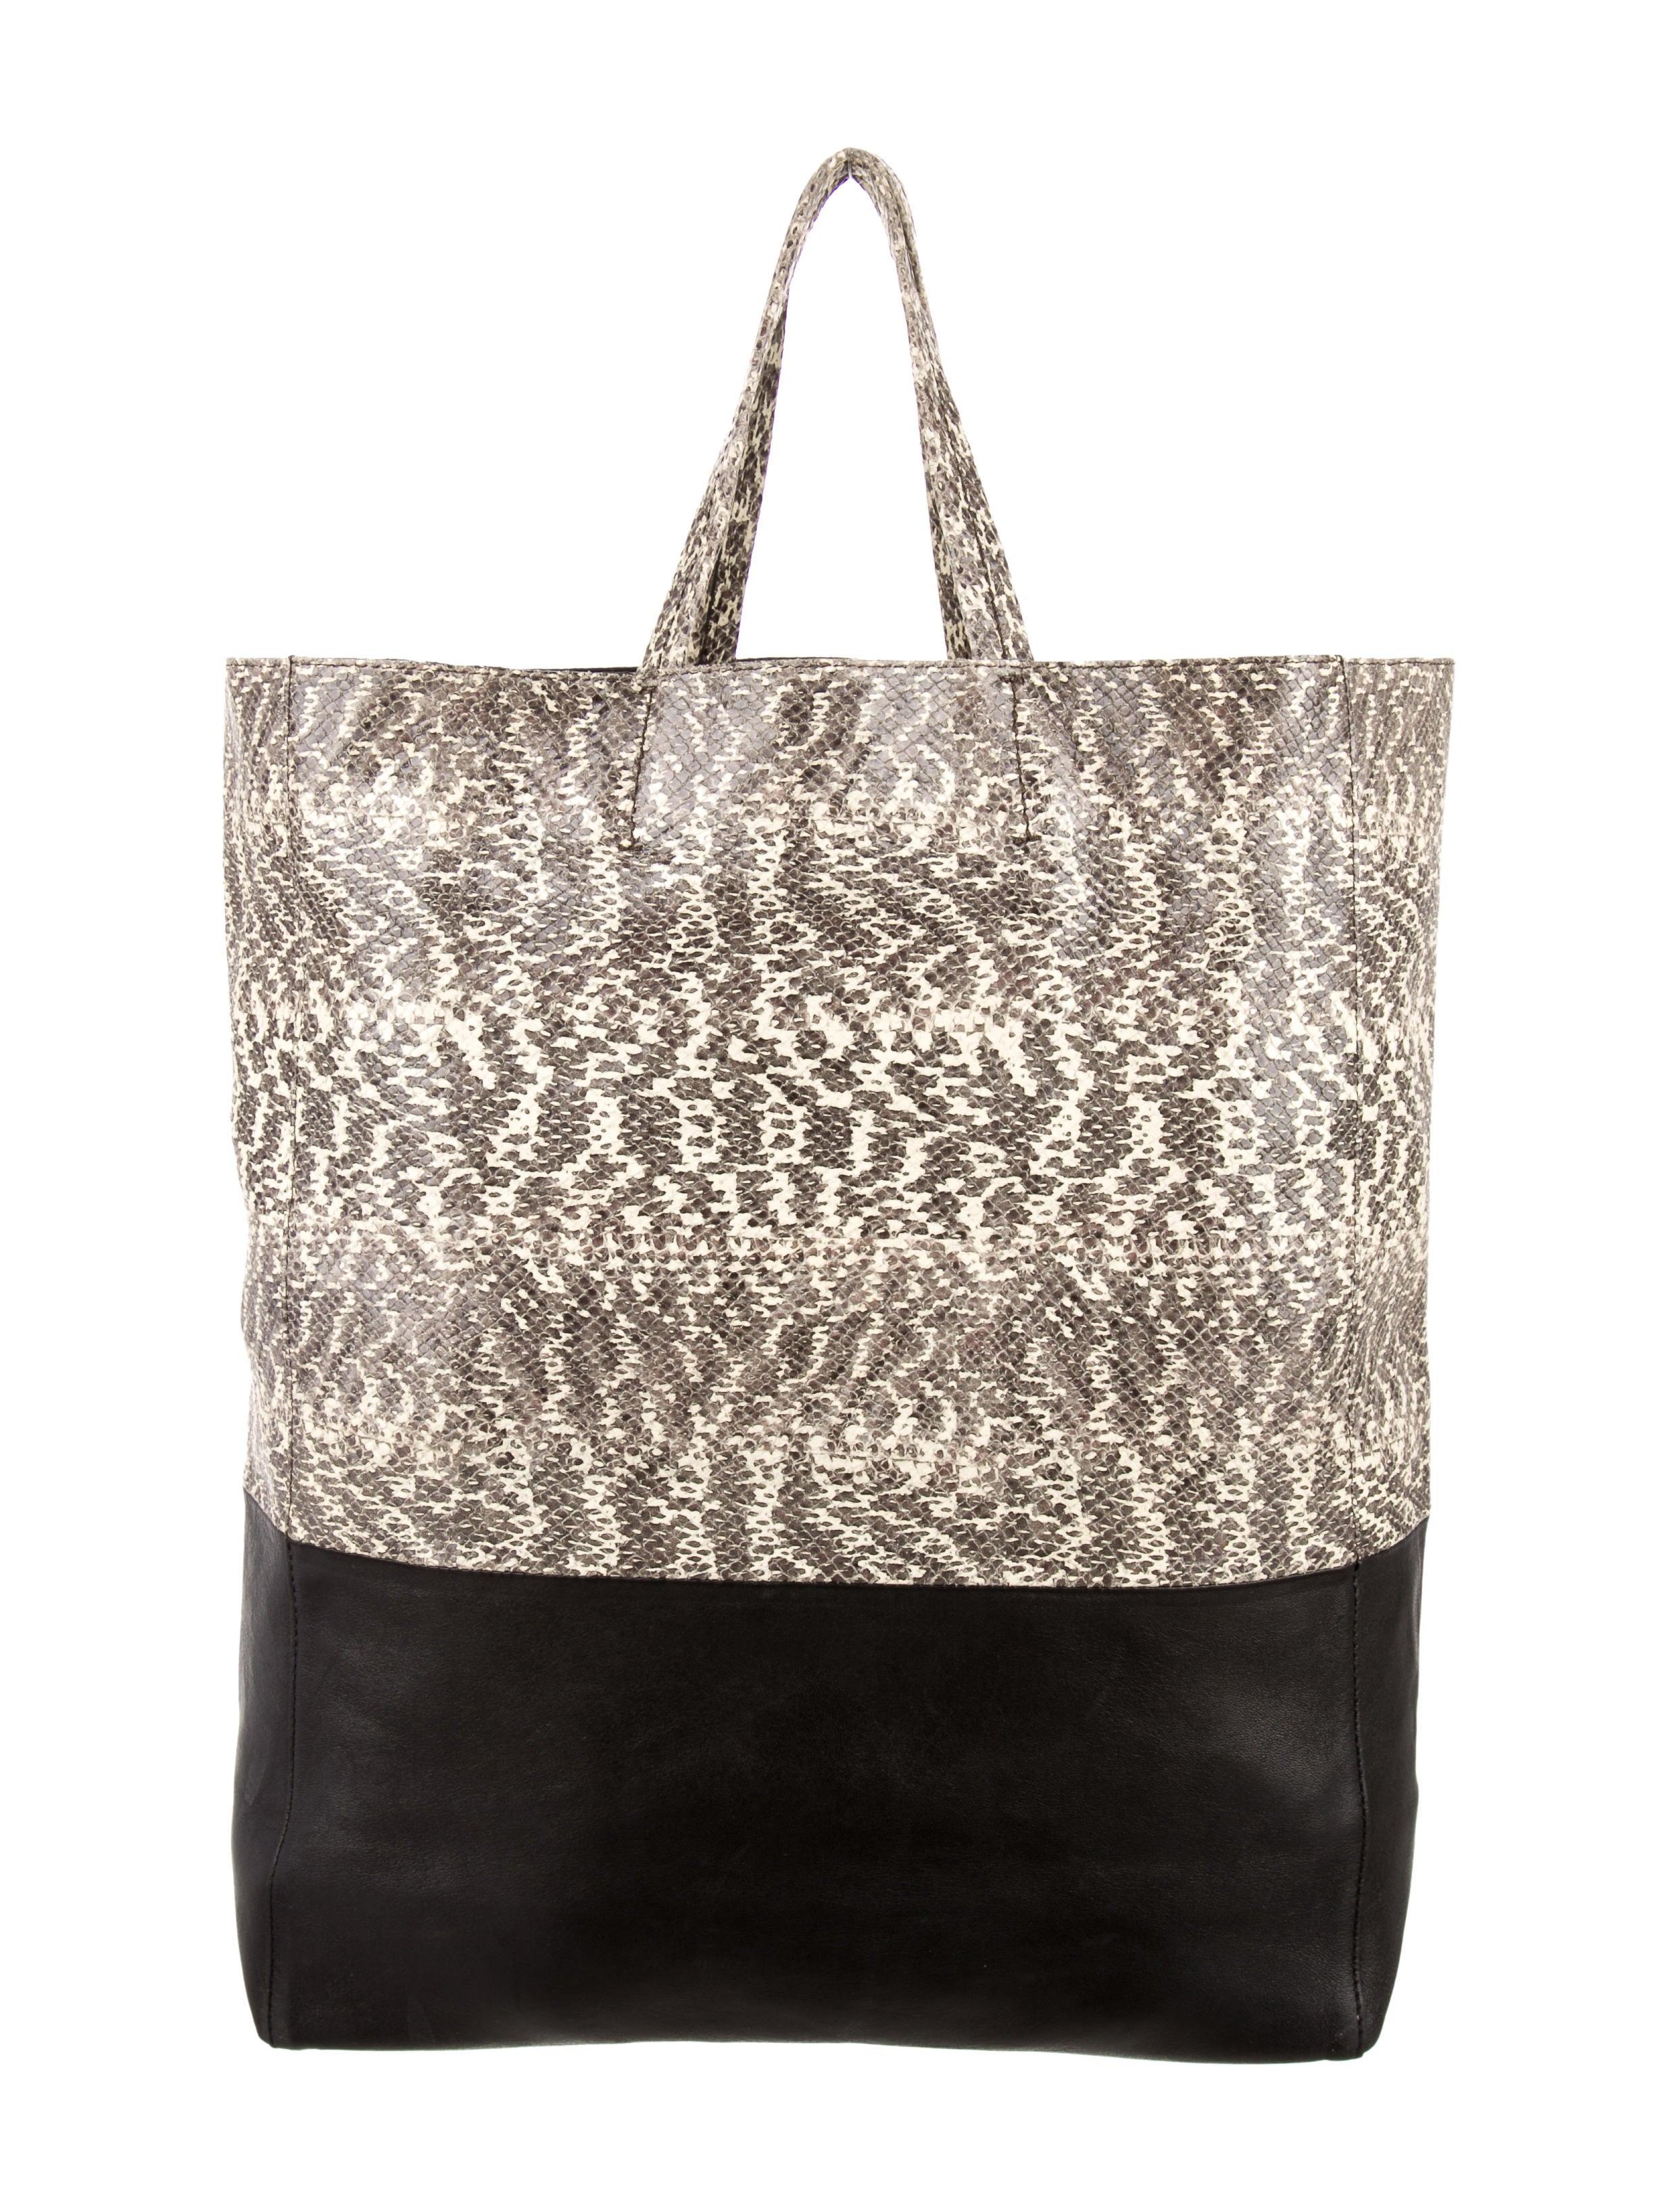 faux celine handbags - celine bi-color cabas tote, celine original bags